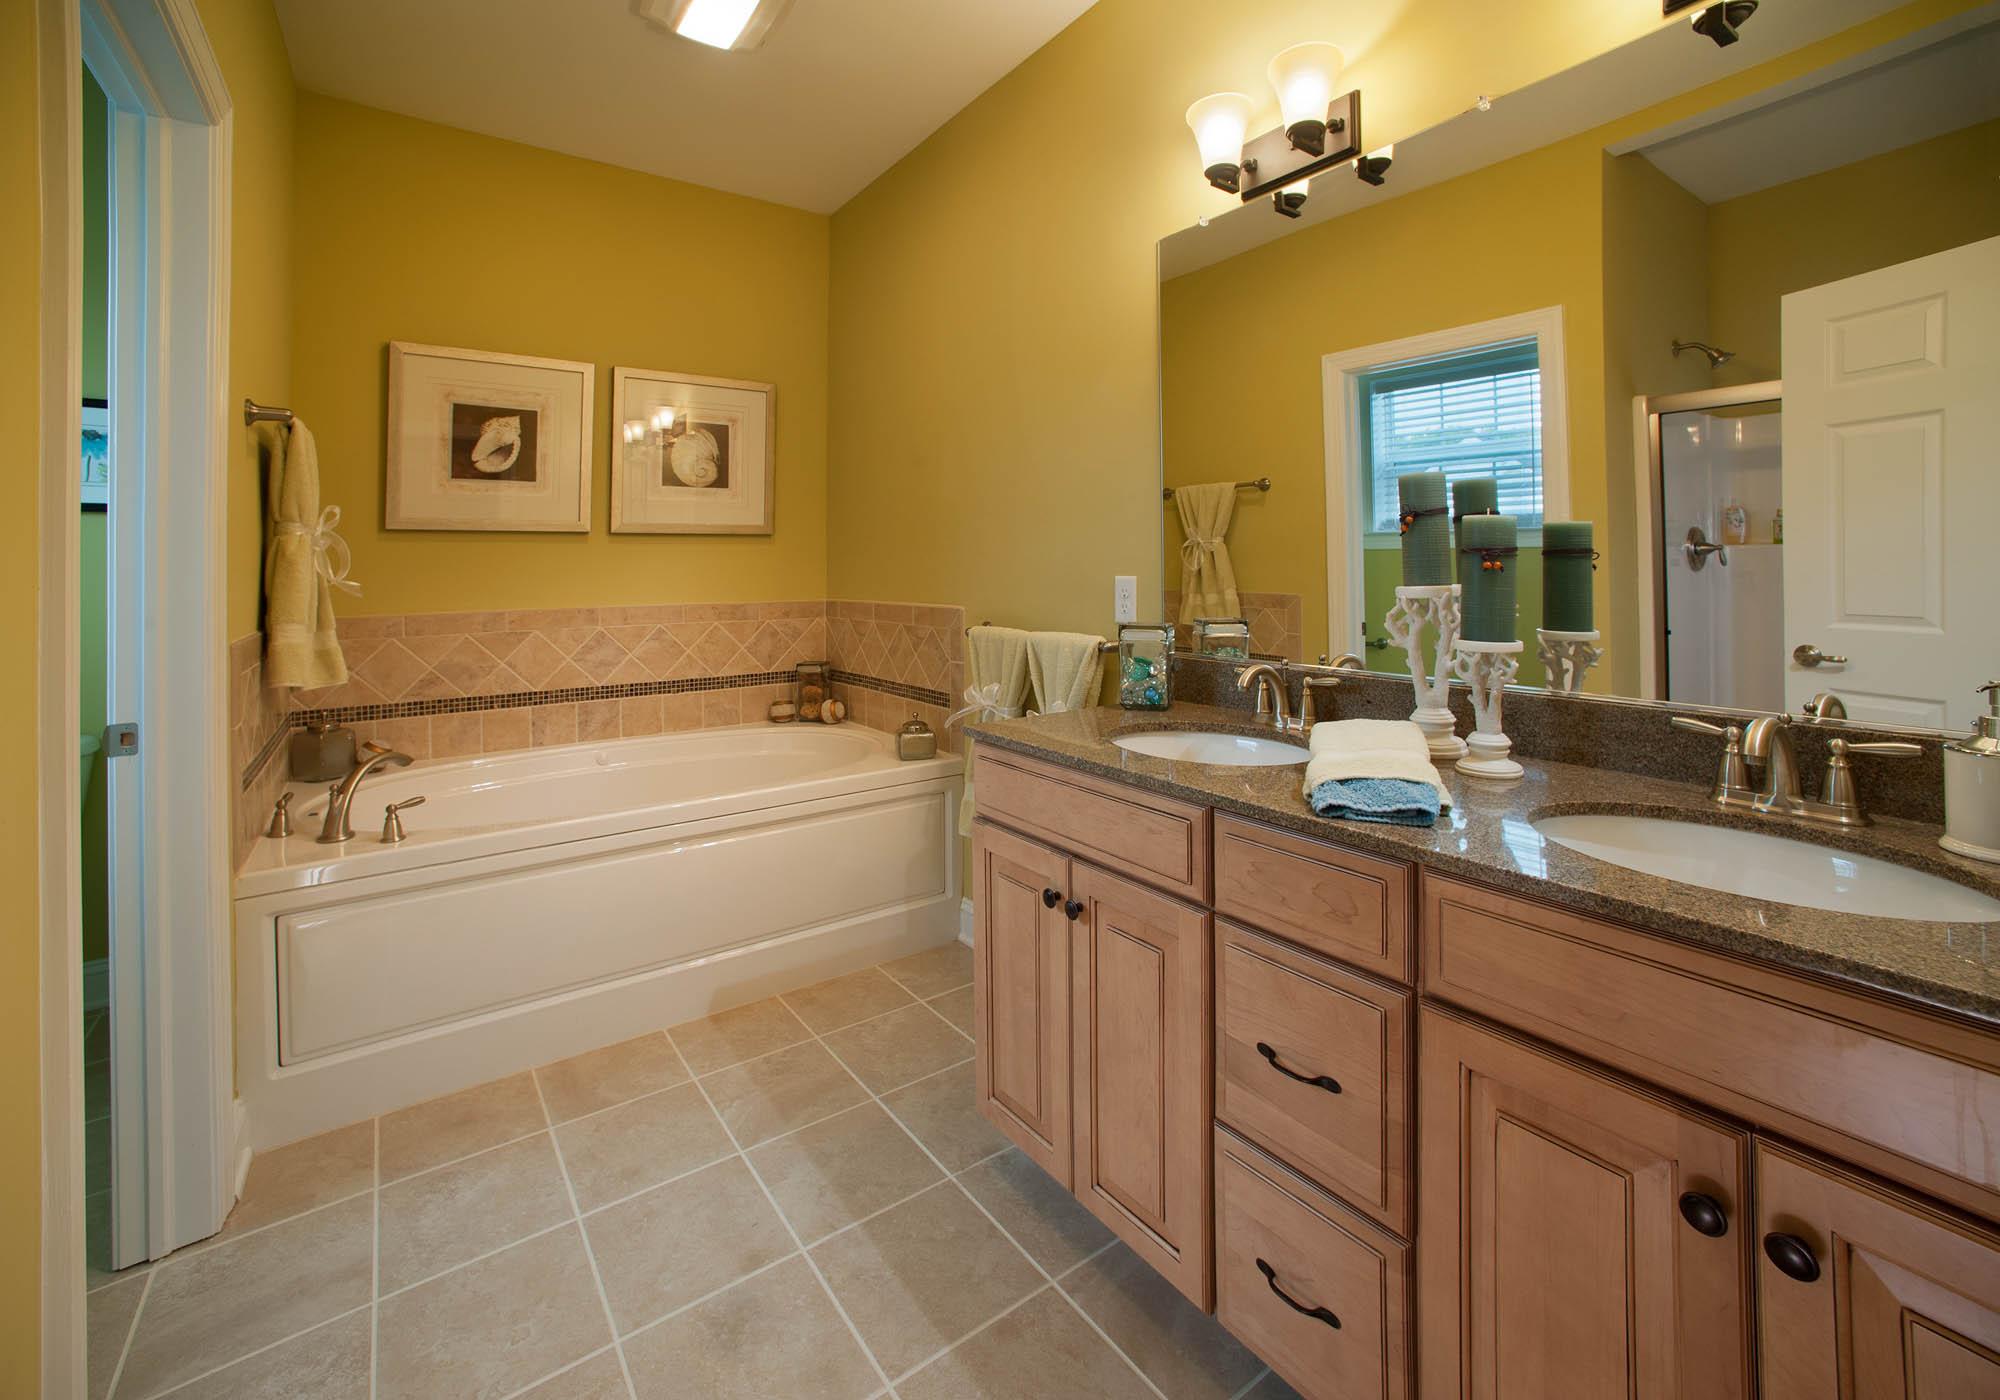 Bathroom Vanities Woodbridge The Woodbridge Spacious Fully Equipped Ranch Home